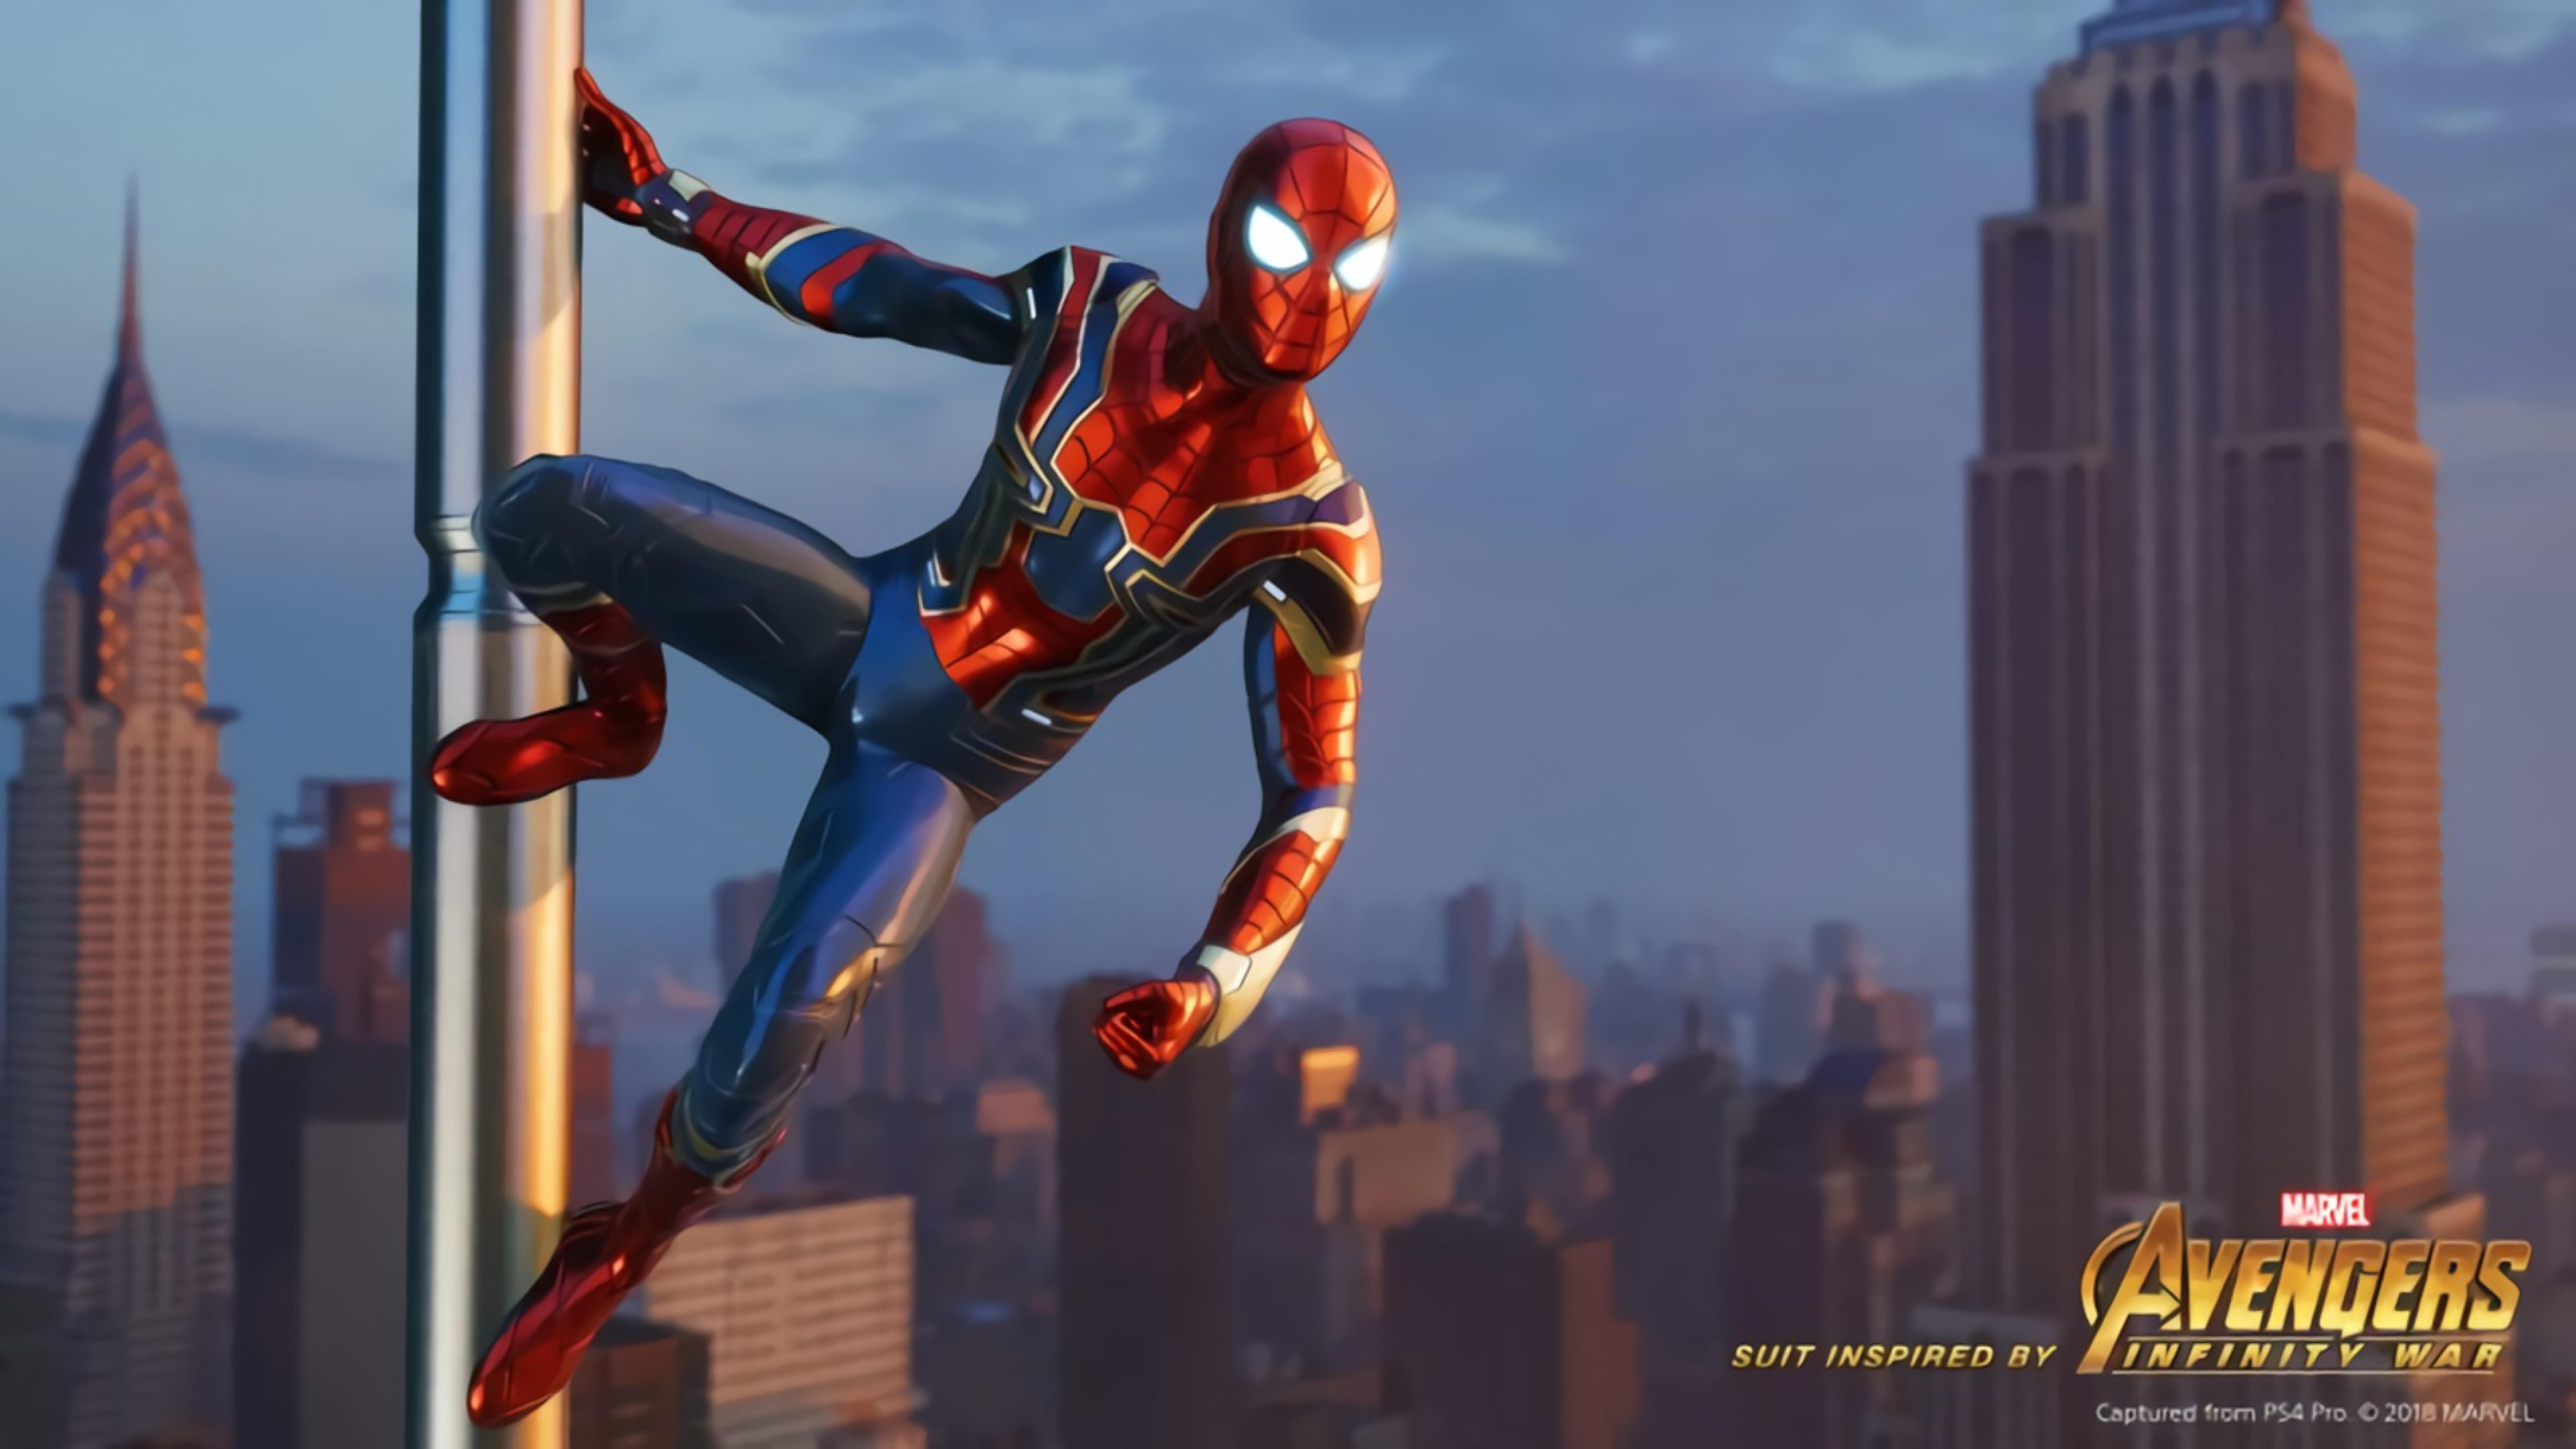 7680x4320 Avengers Infinity War Iron Spider In Spider Man Game 8k